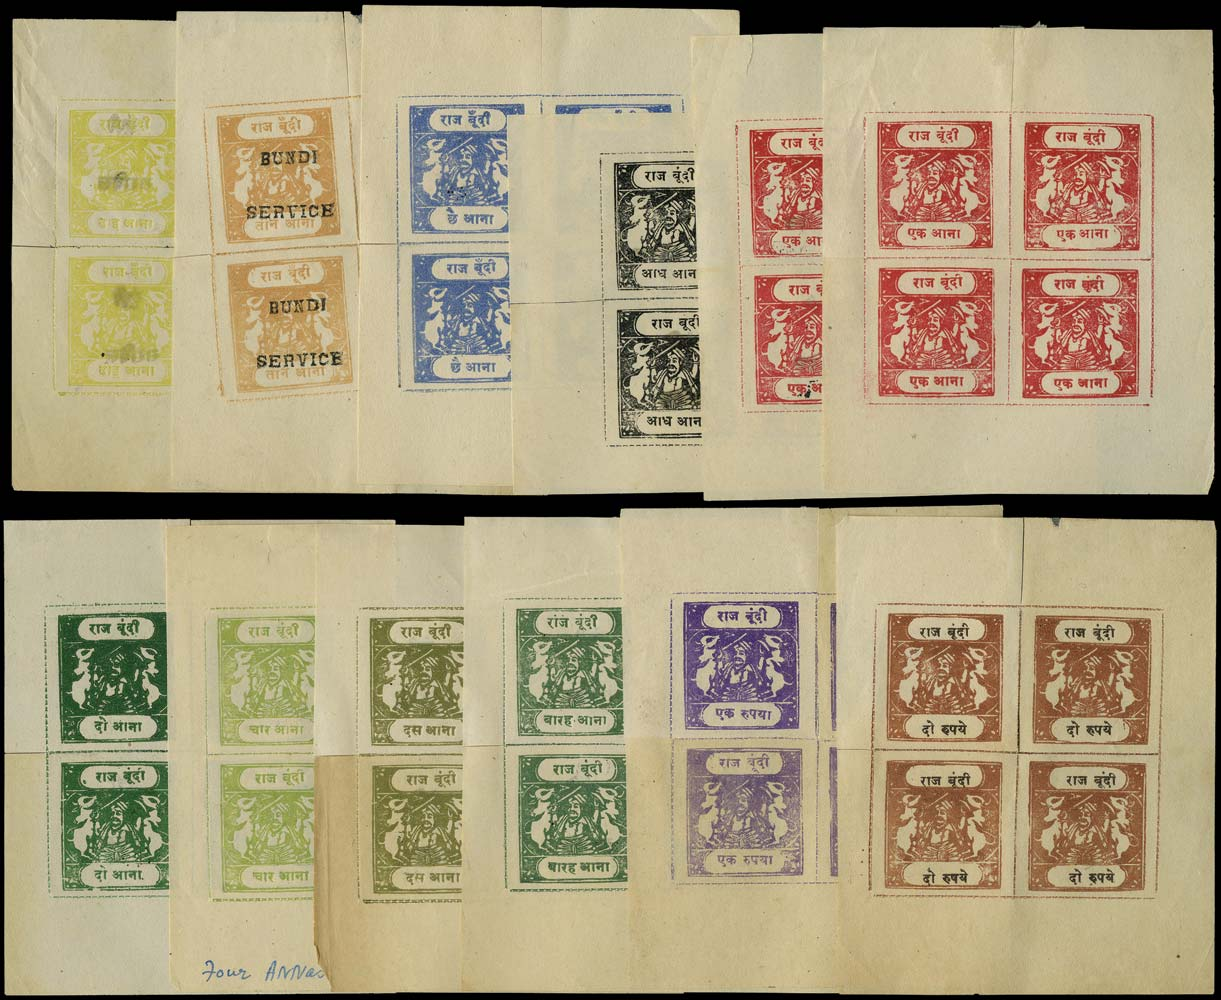 I.F.S. BUNDI 1920  SG21/4, 38/46 Forgery